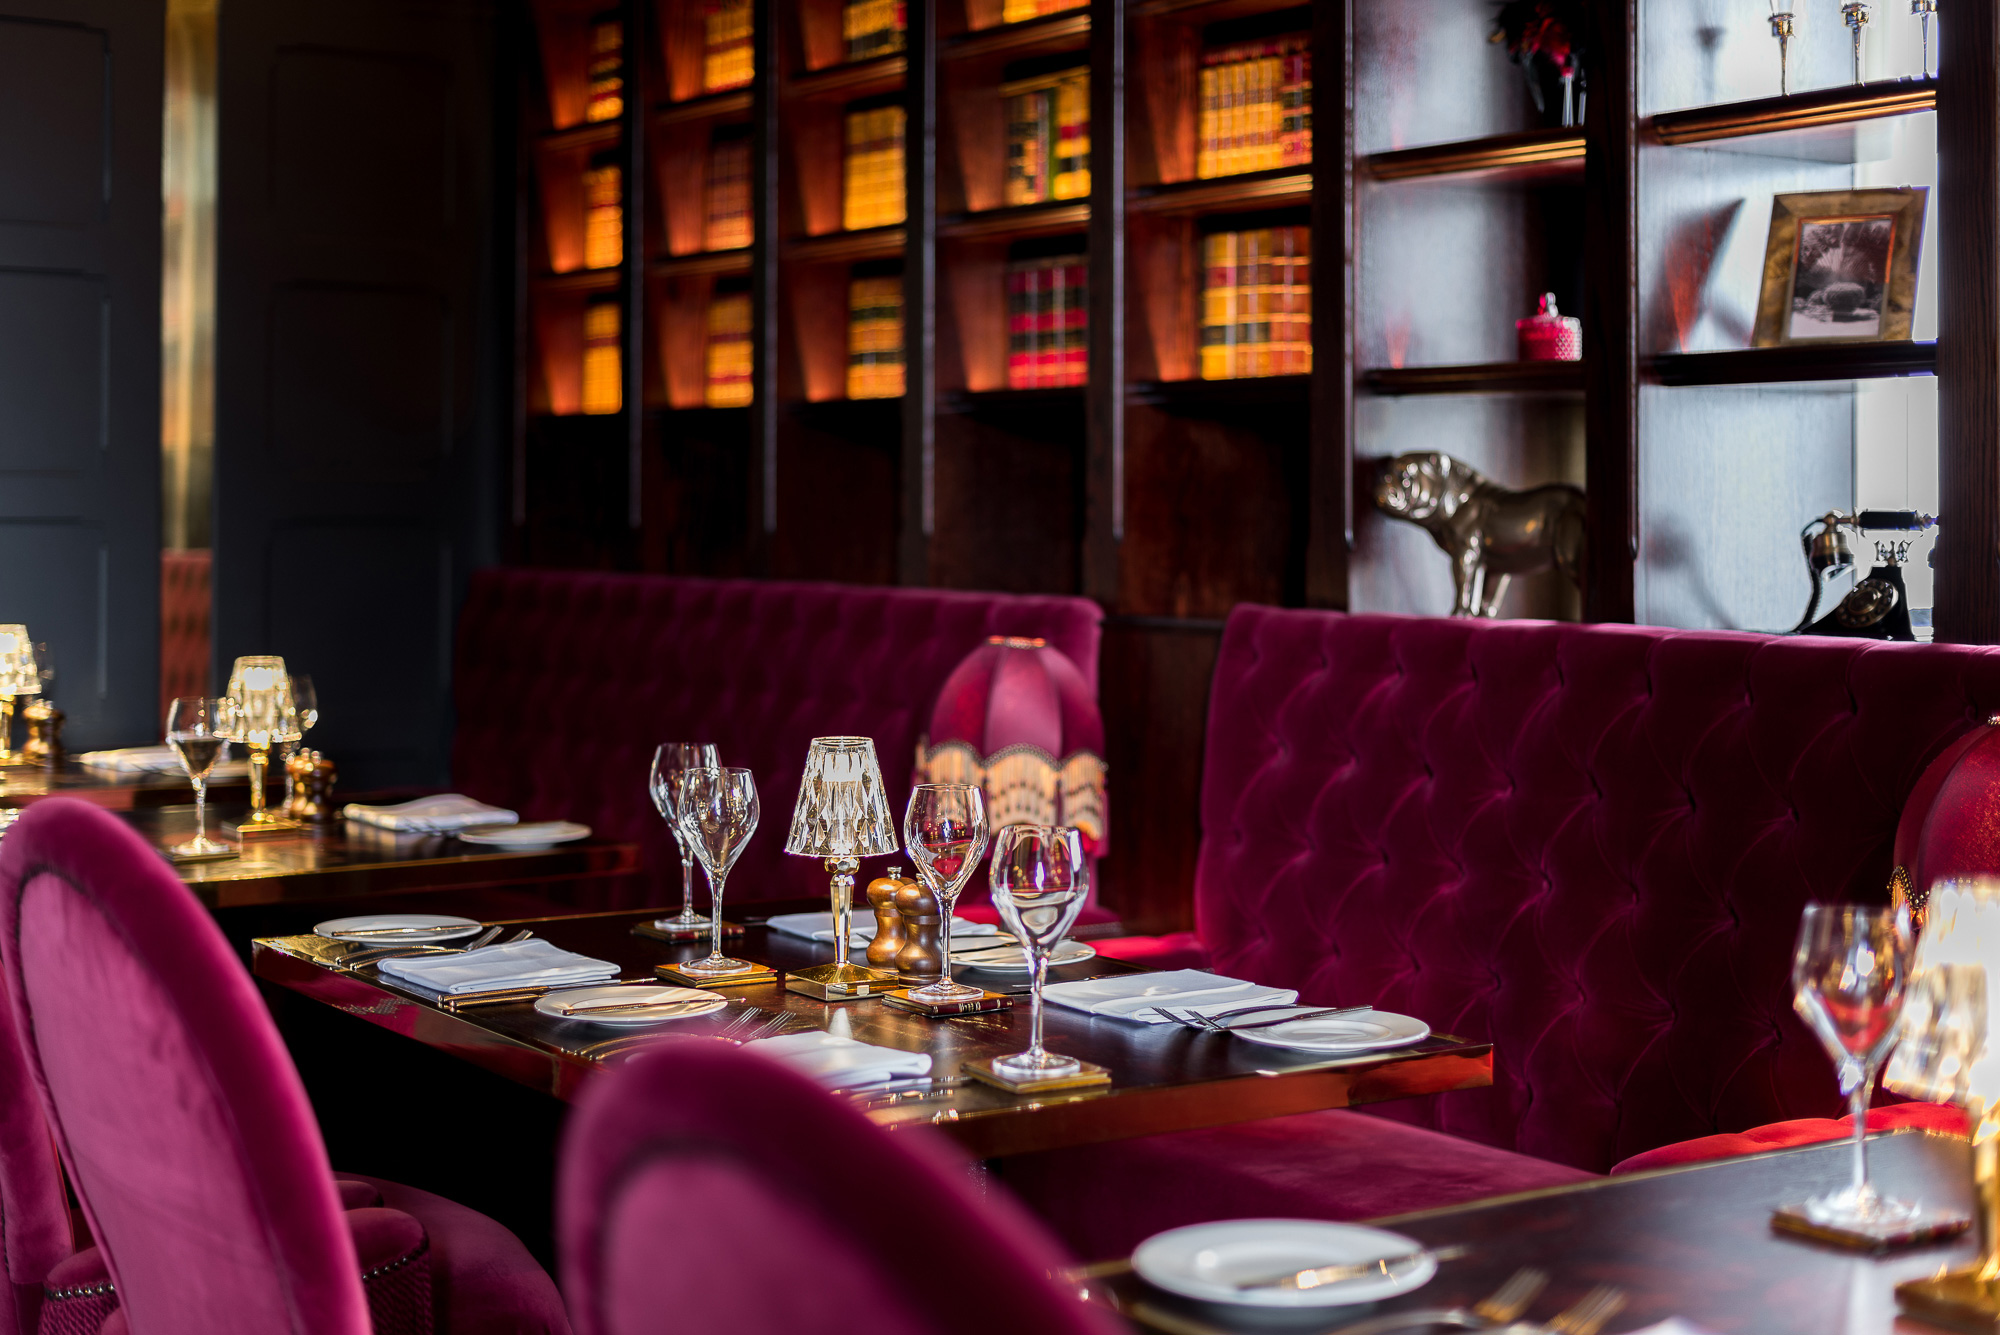 hotel-restaurant-interior-photography-detail.jpg